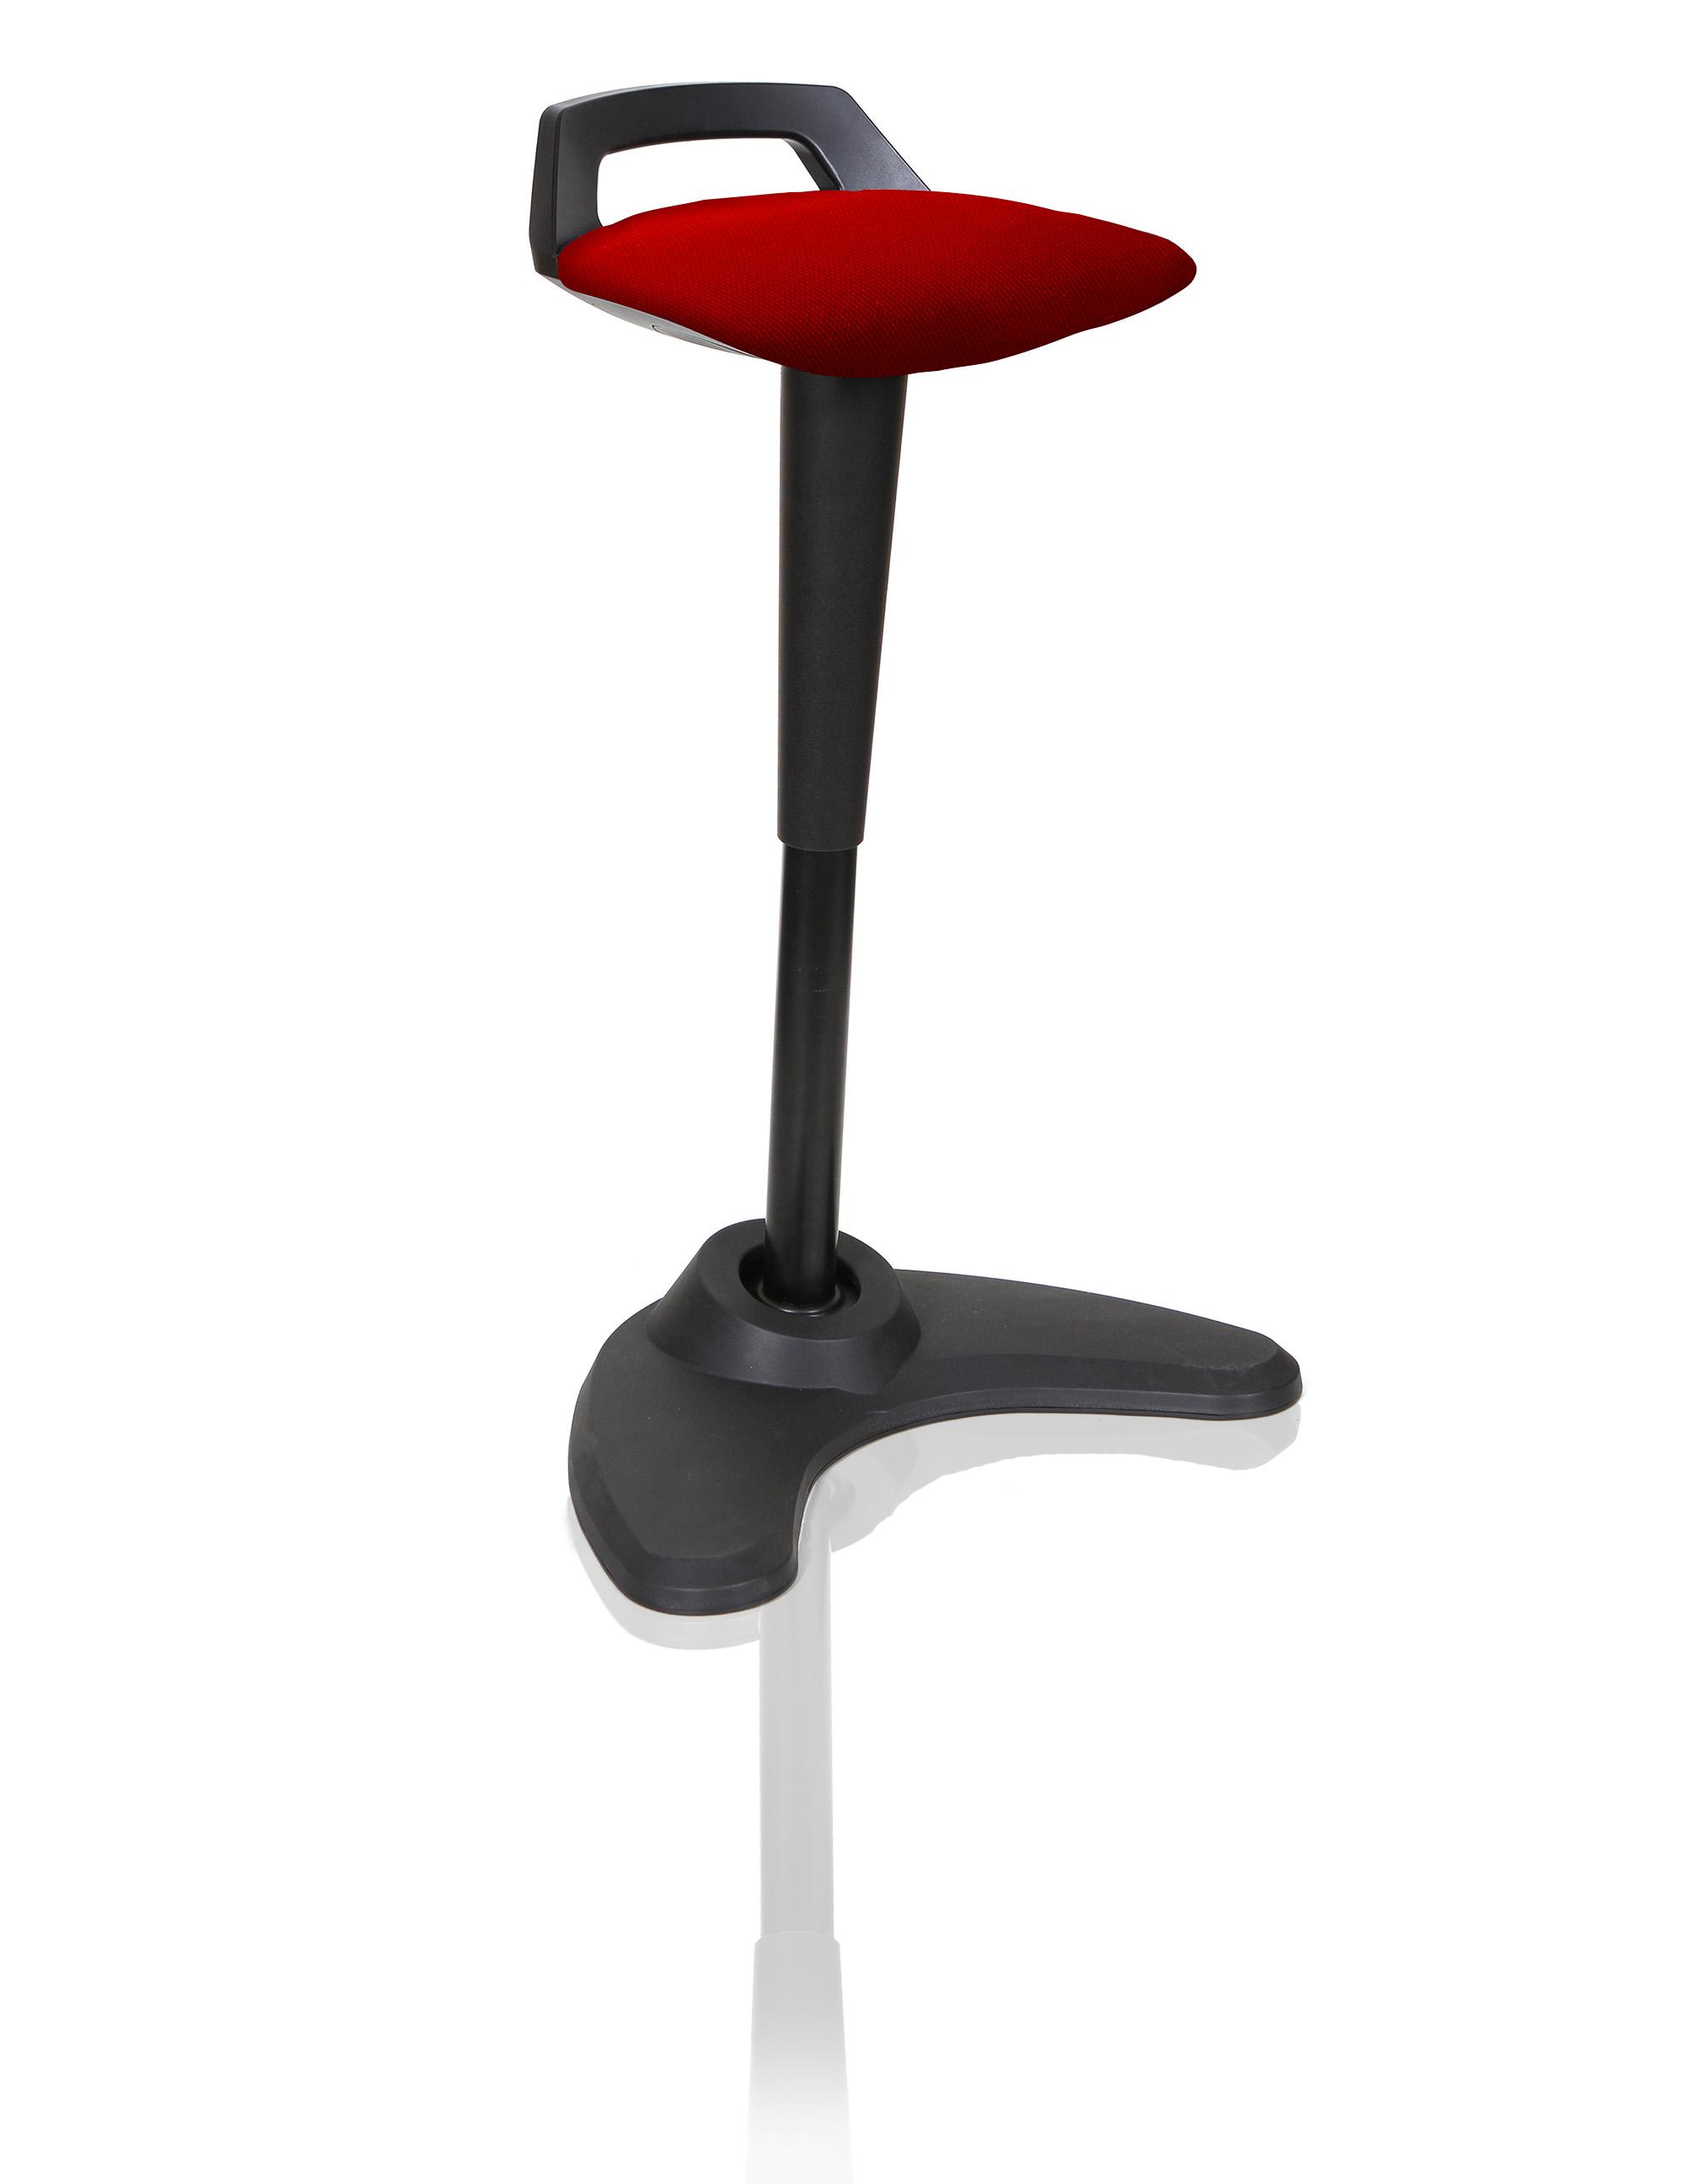 Spry Stool Black Frame Bespoke Seat Bergamot Cherry KCUP1202